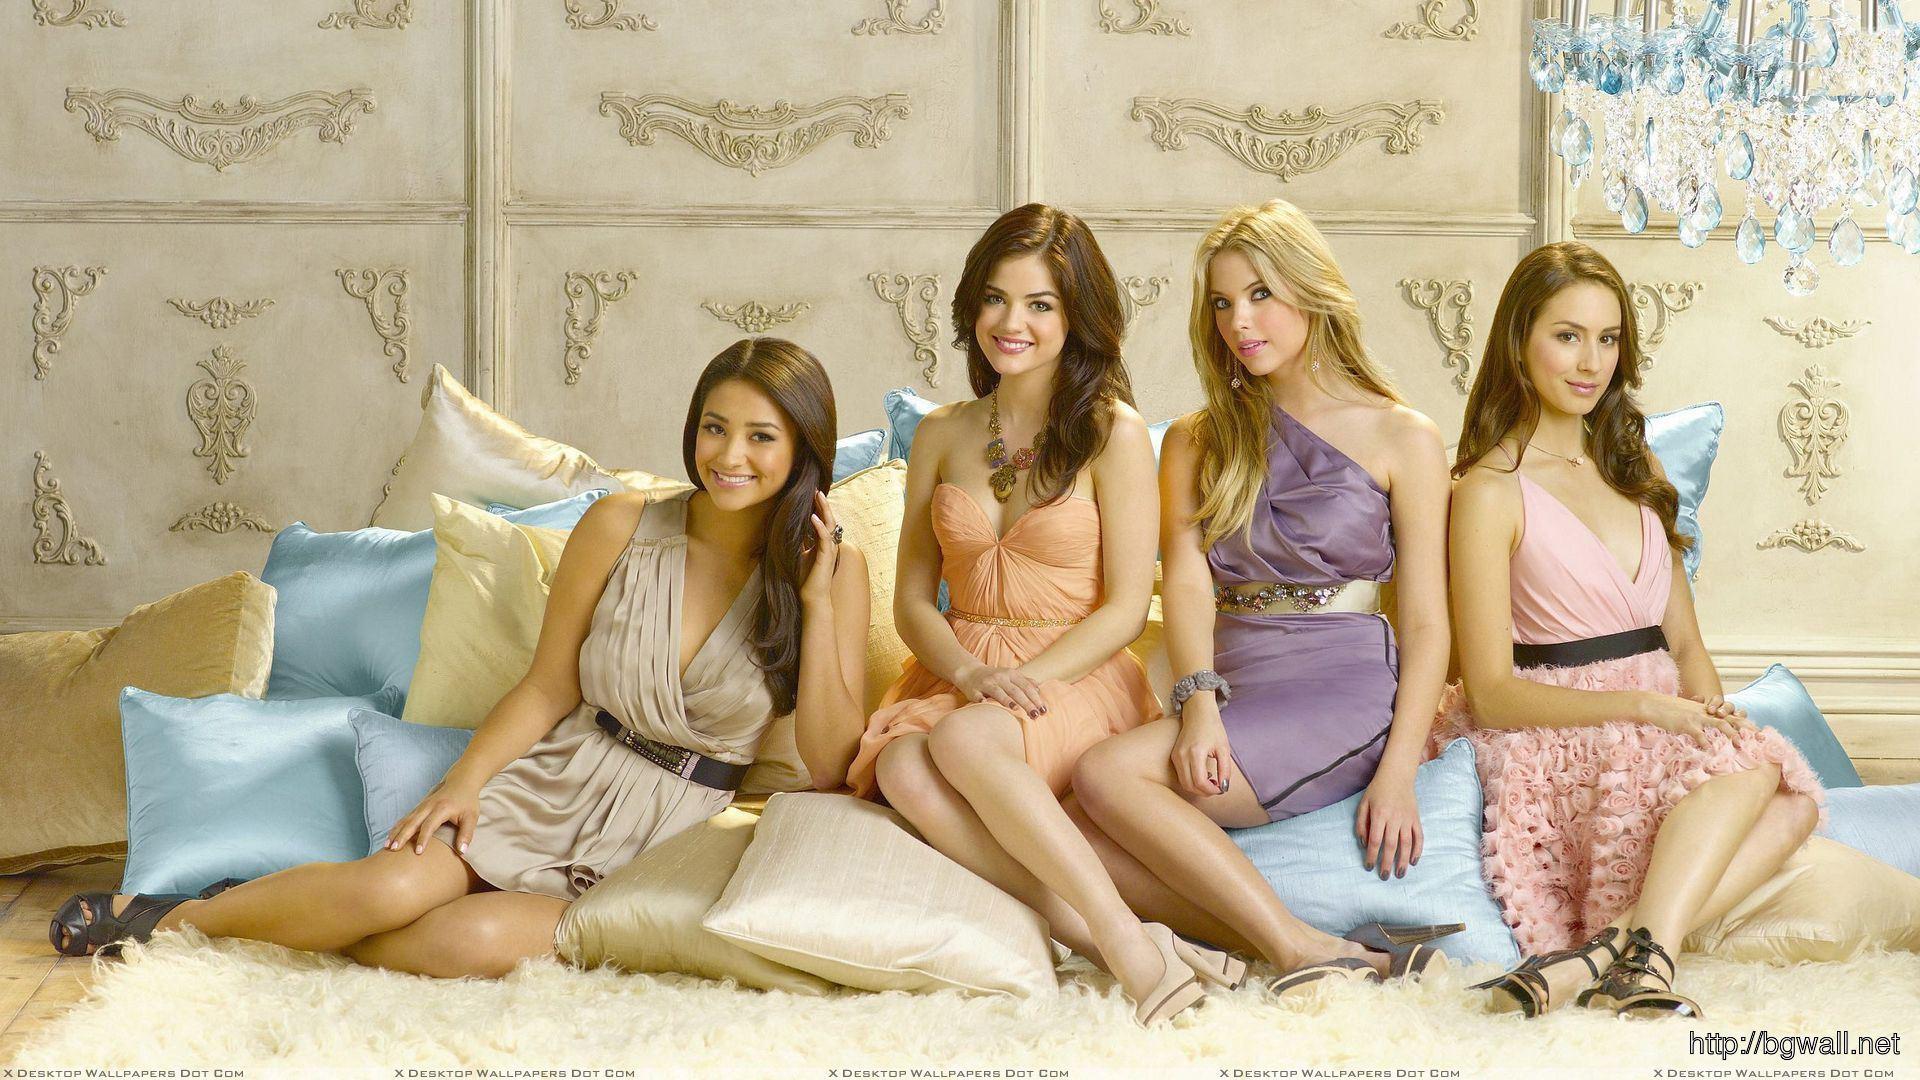 Pretty Little Liars Girls Smiling N Sitting Pose Wallpaper -4048